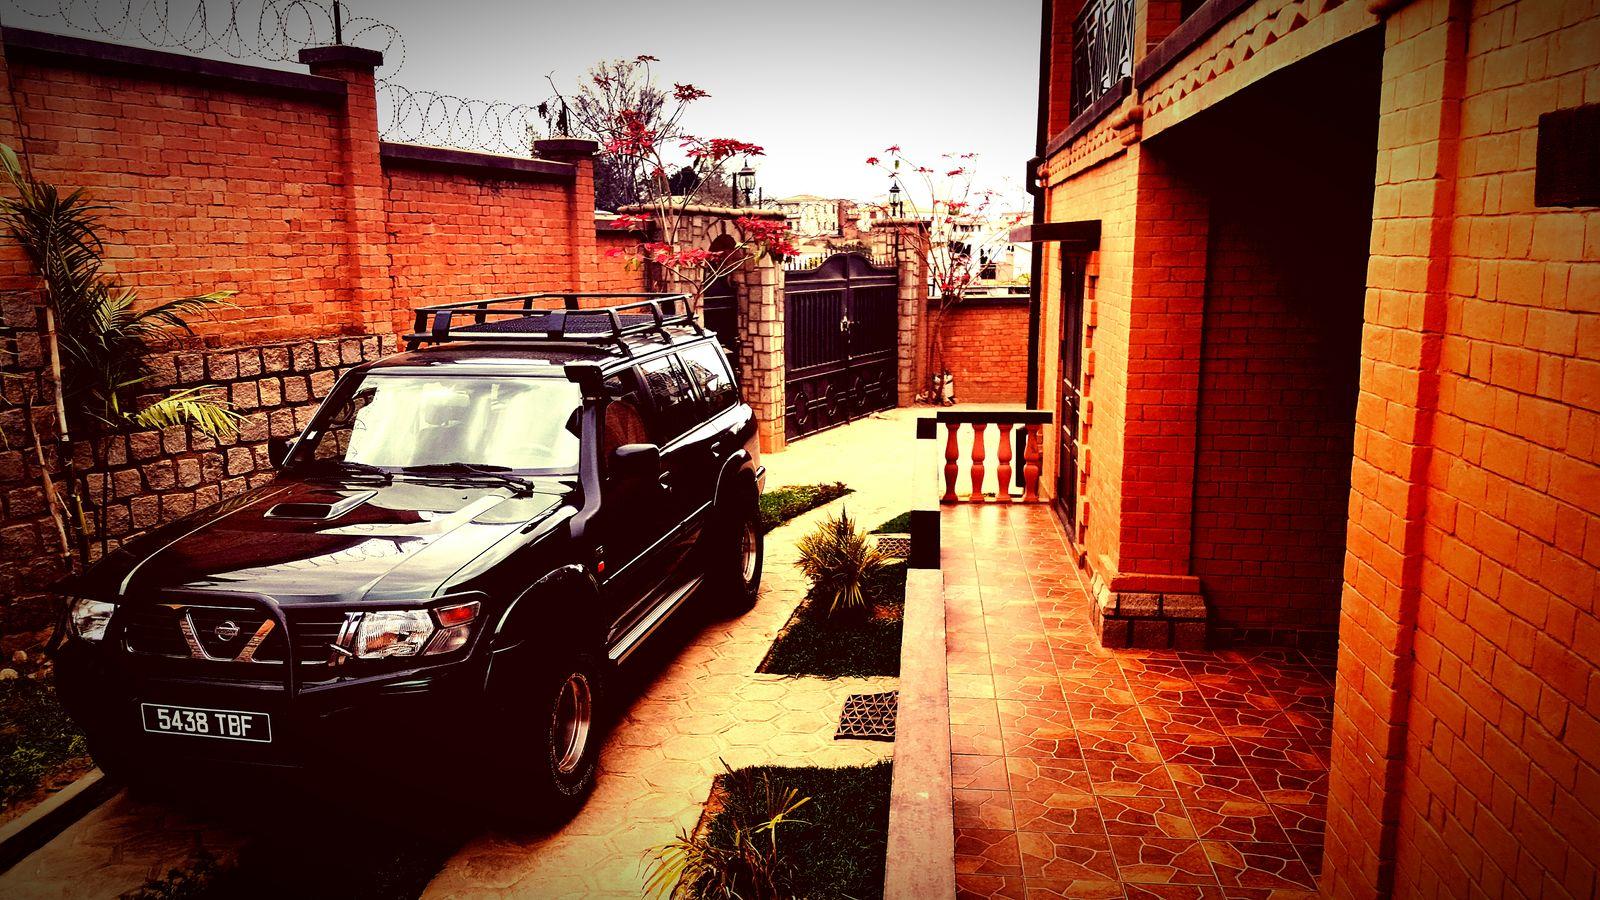 Love my car Nissan Patrol Patrol  Y61 Car 4x4 4x4wd Offroad OffRoadTruck Offroad